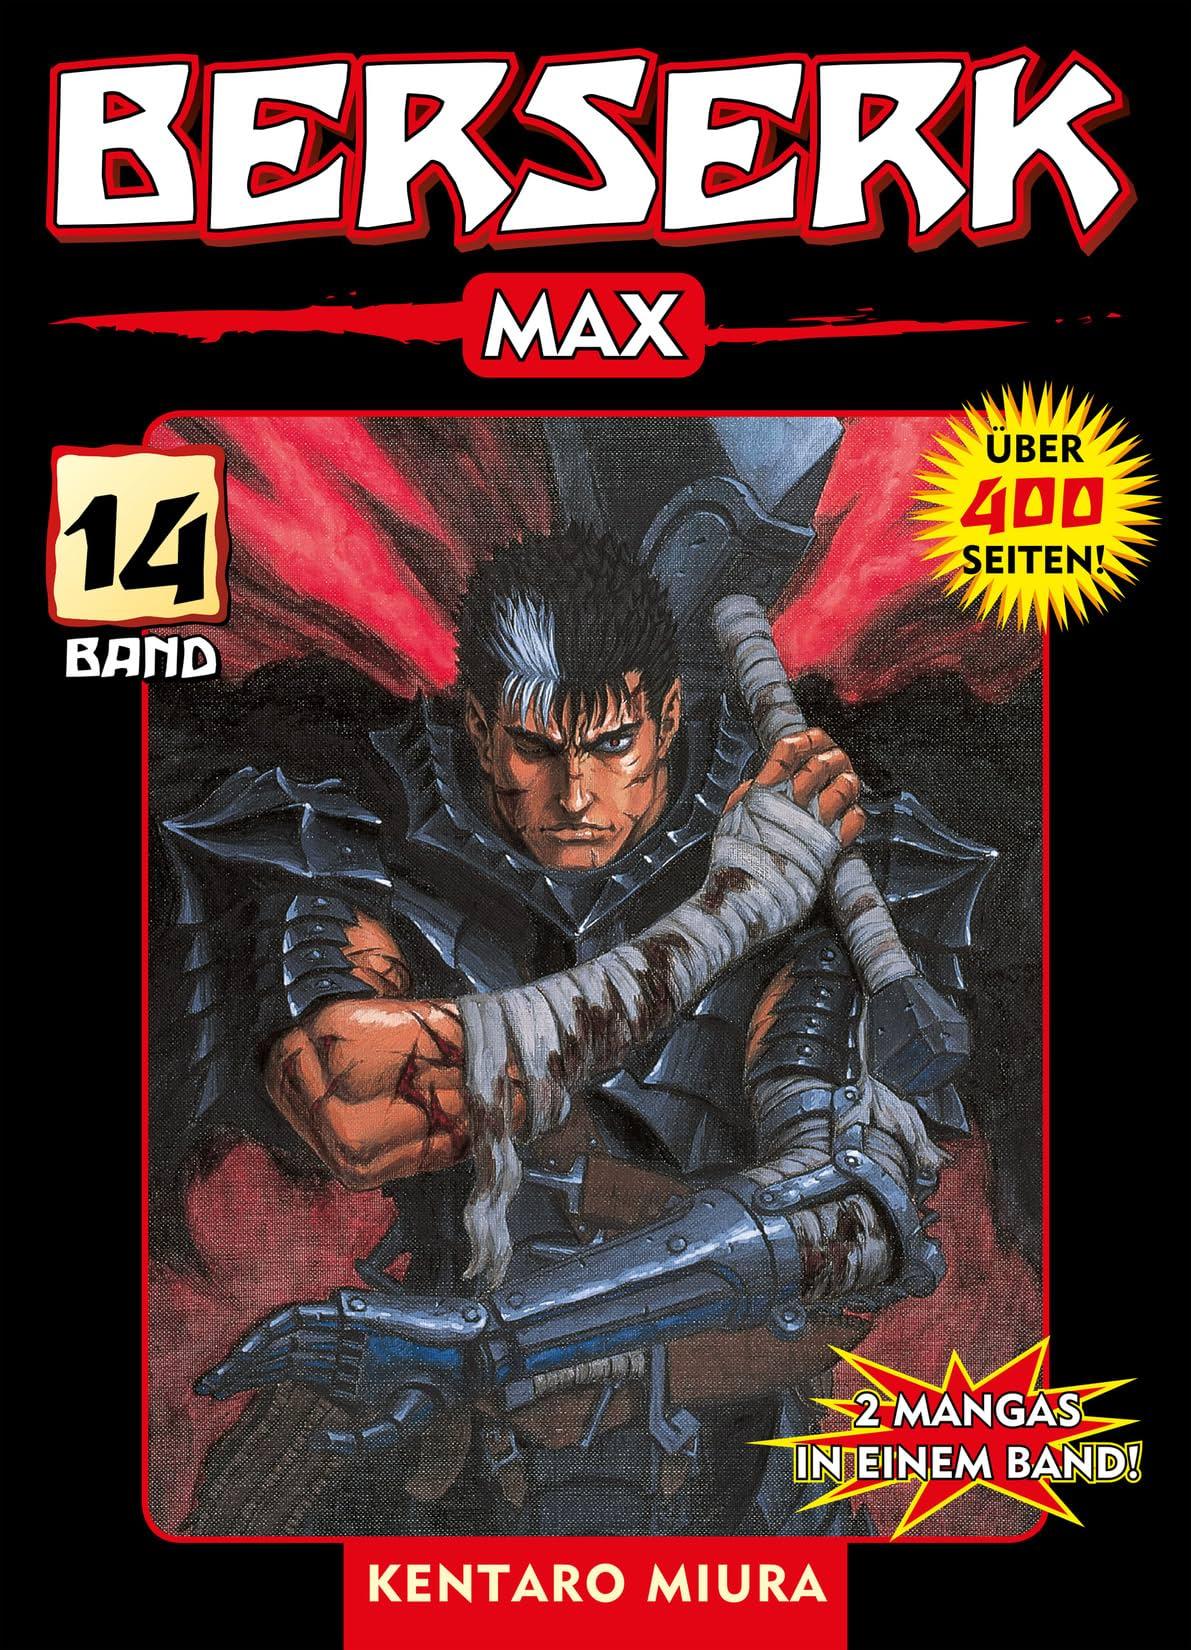 Berserk Max Vol. 14